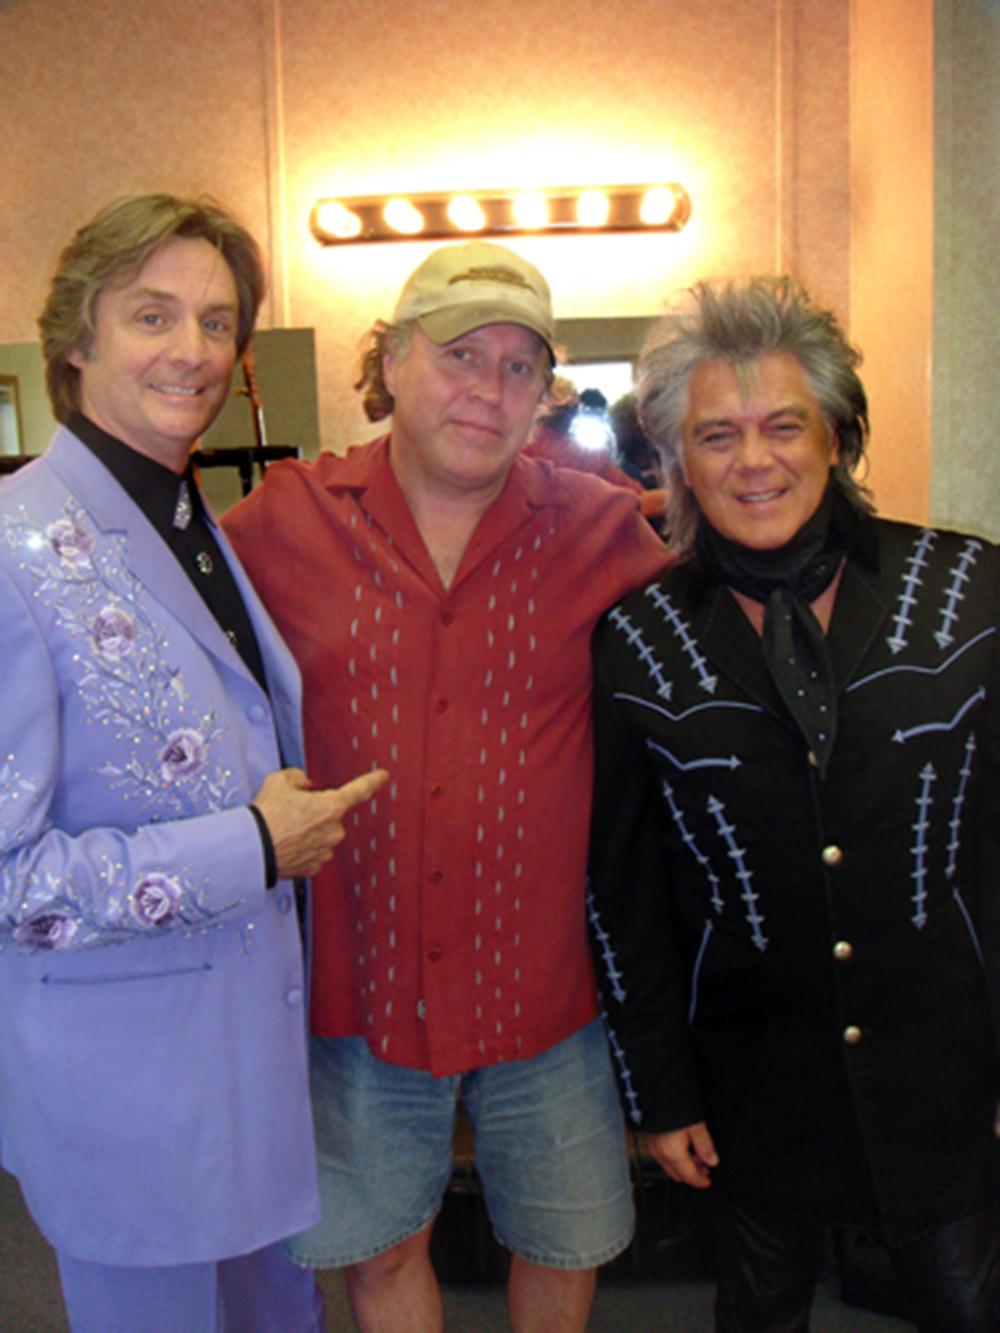 2011 - Harry Stinson, Peter North & Marty Stuart